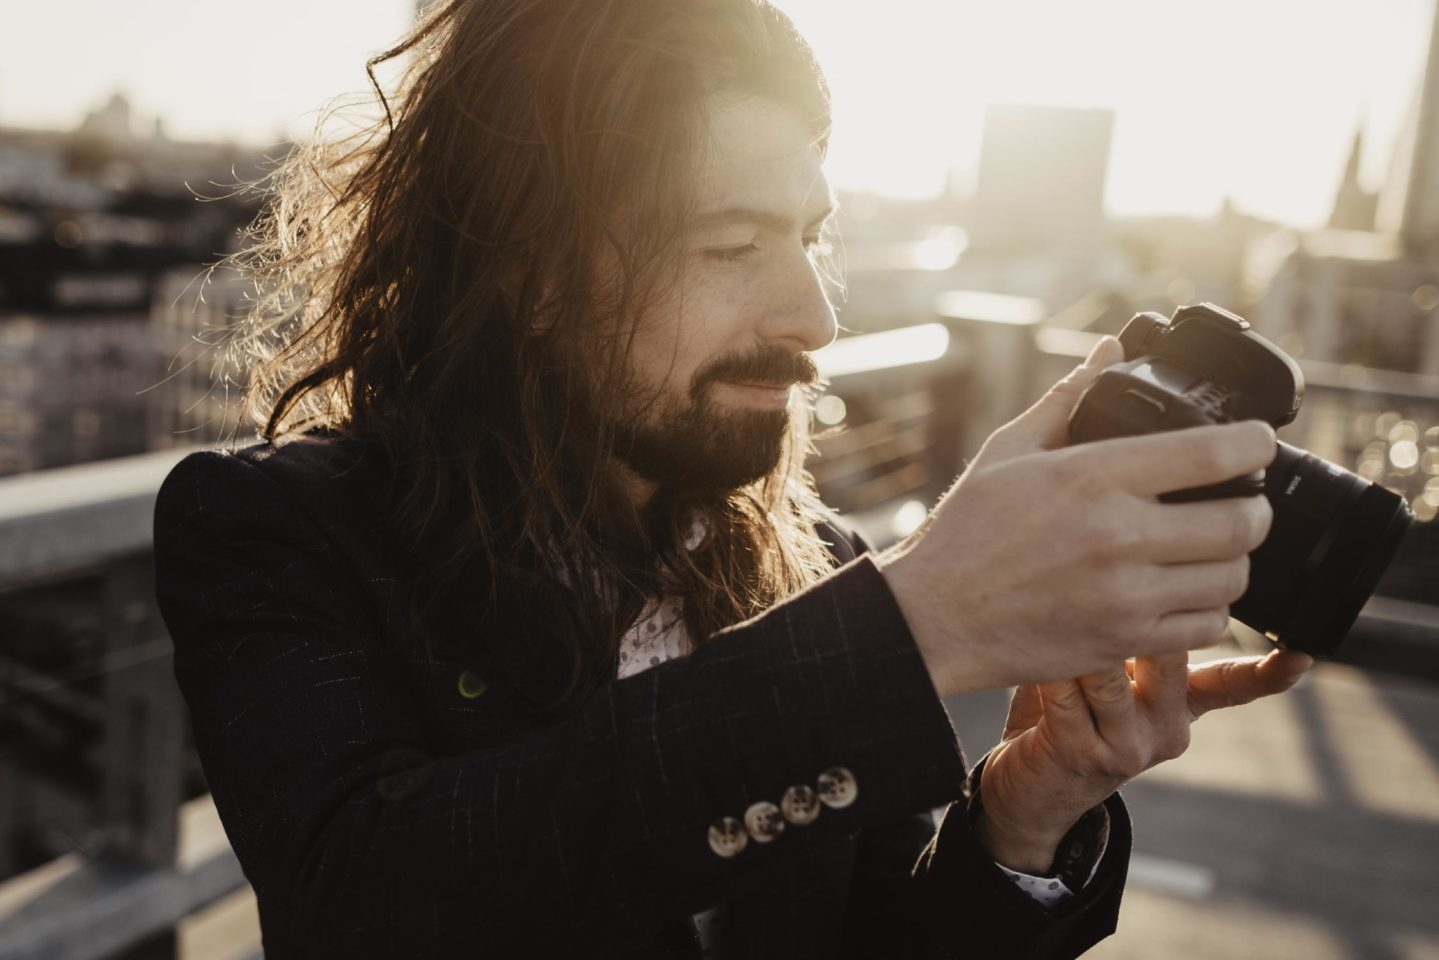 fotograf-koeln-kamera